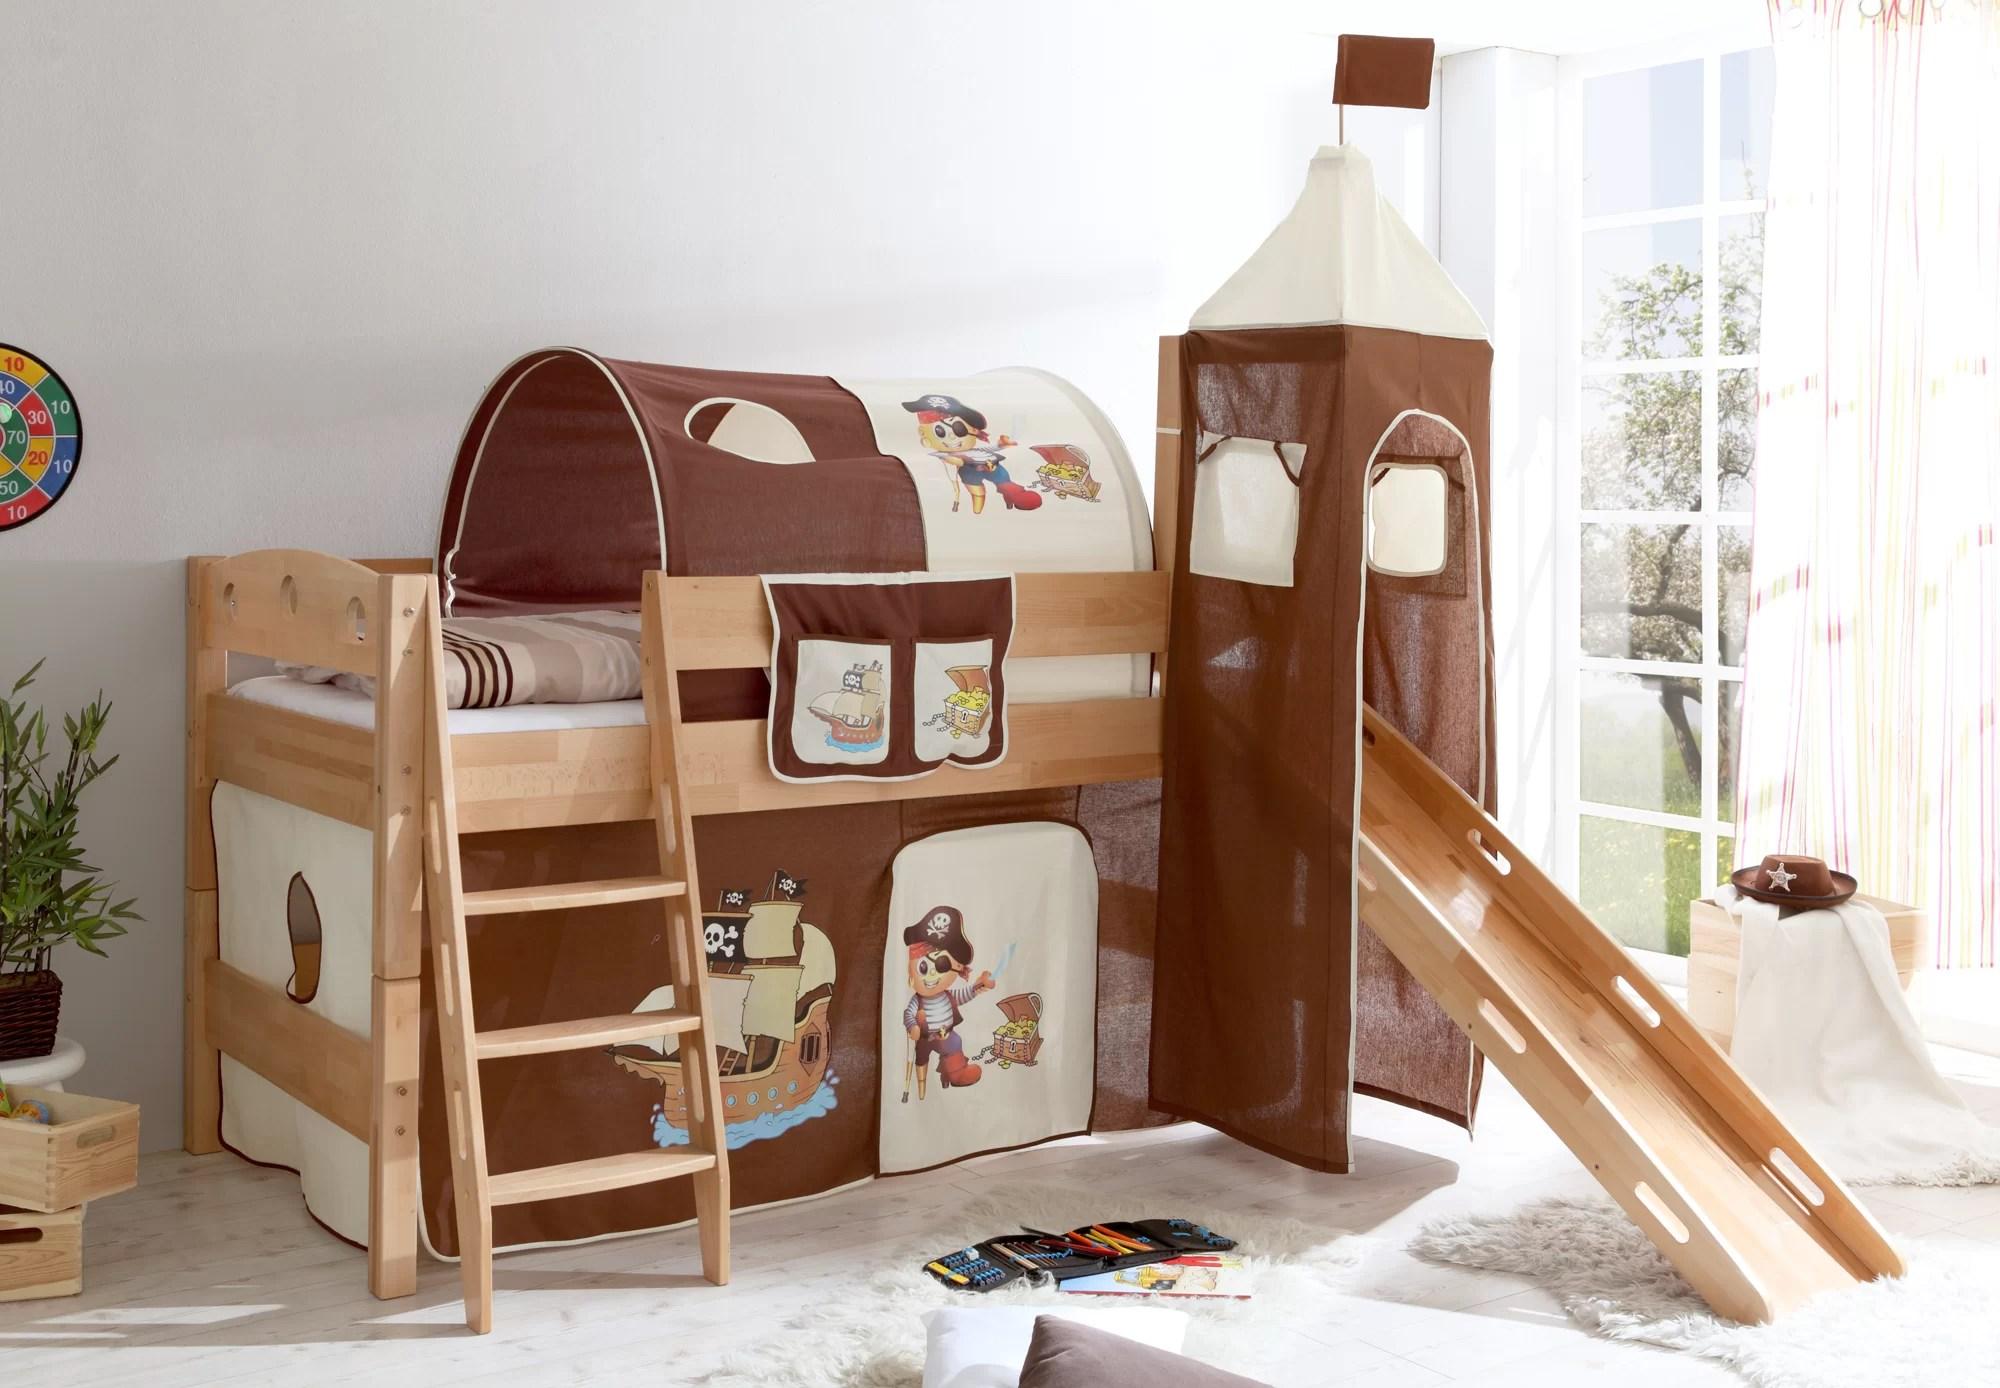 Ticaa Etagenbett : Ticaa etagenbett preisvergleich günstig bei idealo kaufen